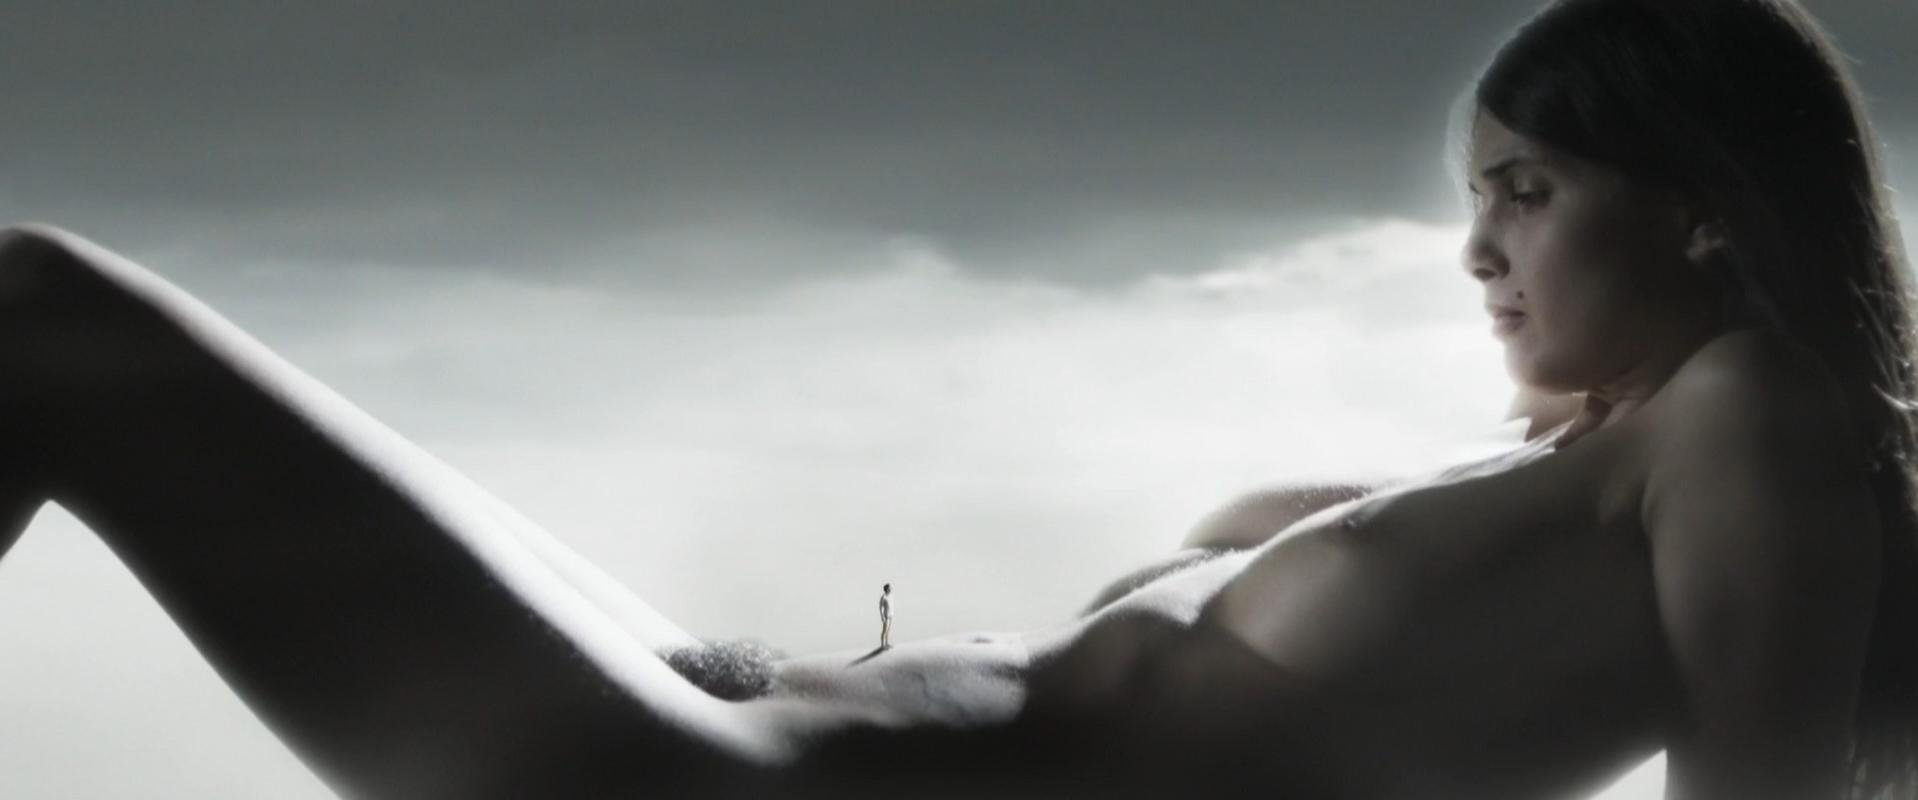 Zoi Gorman nude - Beyond Sleep (2016)